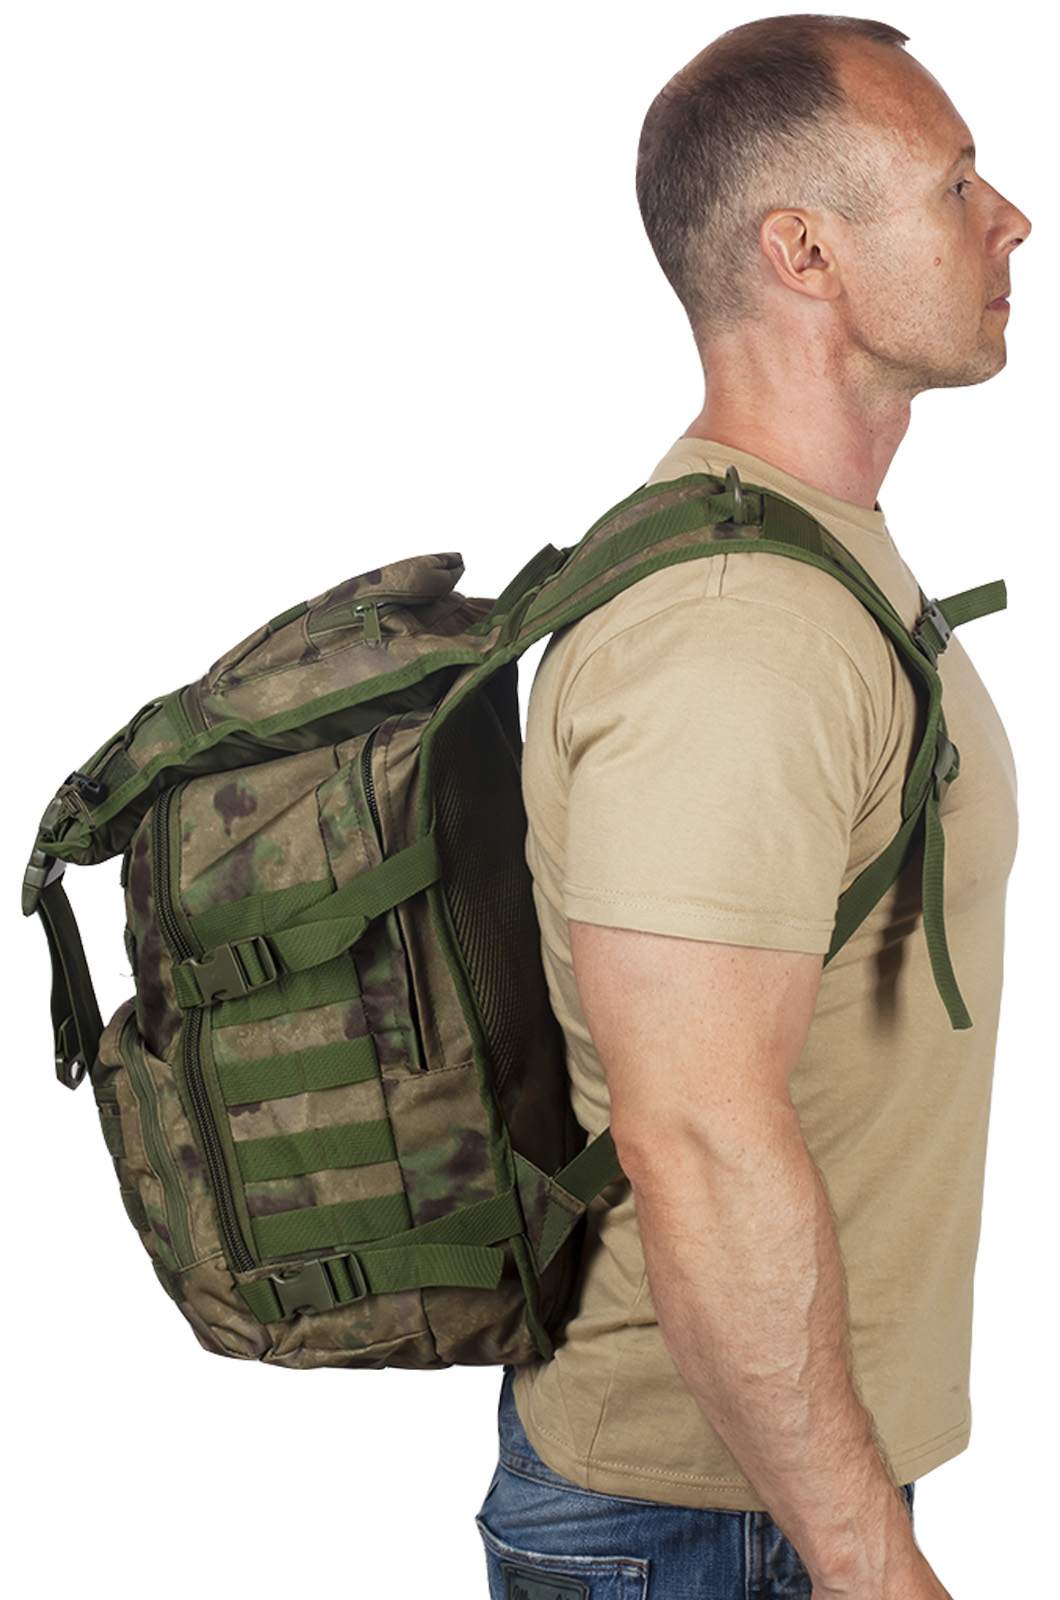 Тактический рюкзак A-TACS FG Camo 20L с доставкой